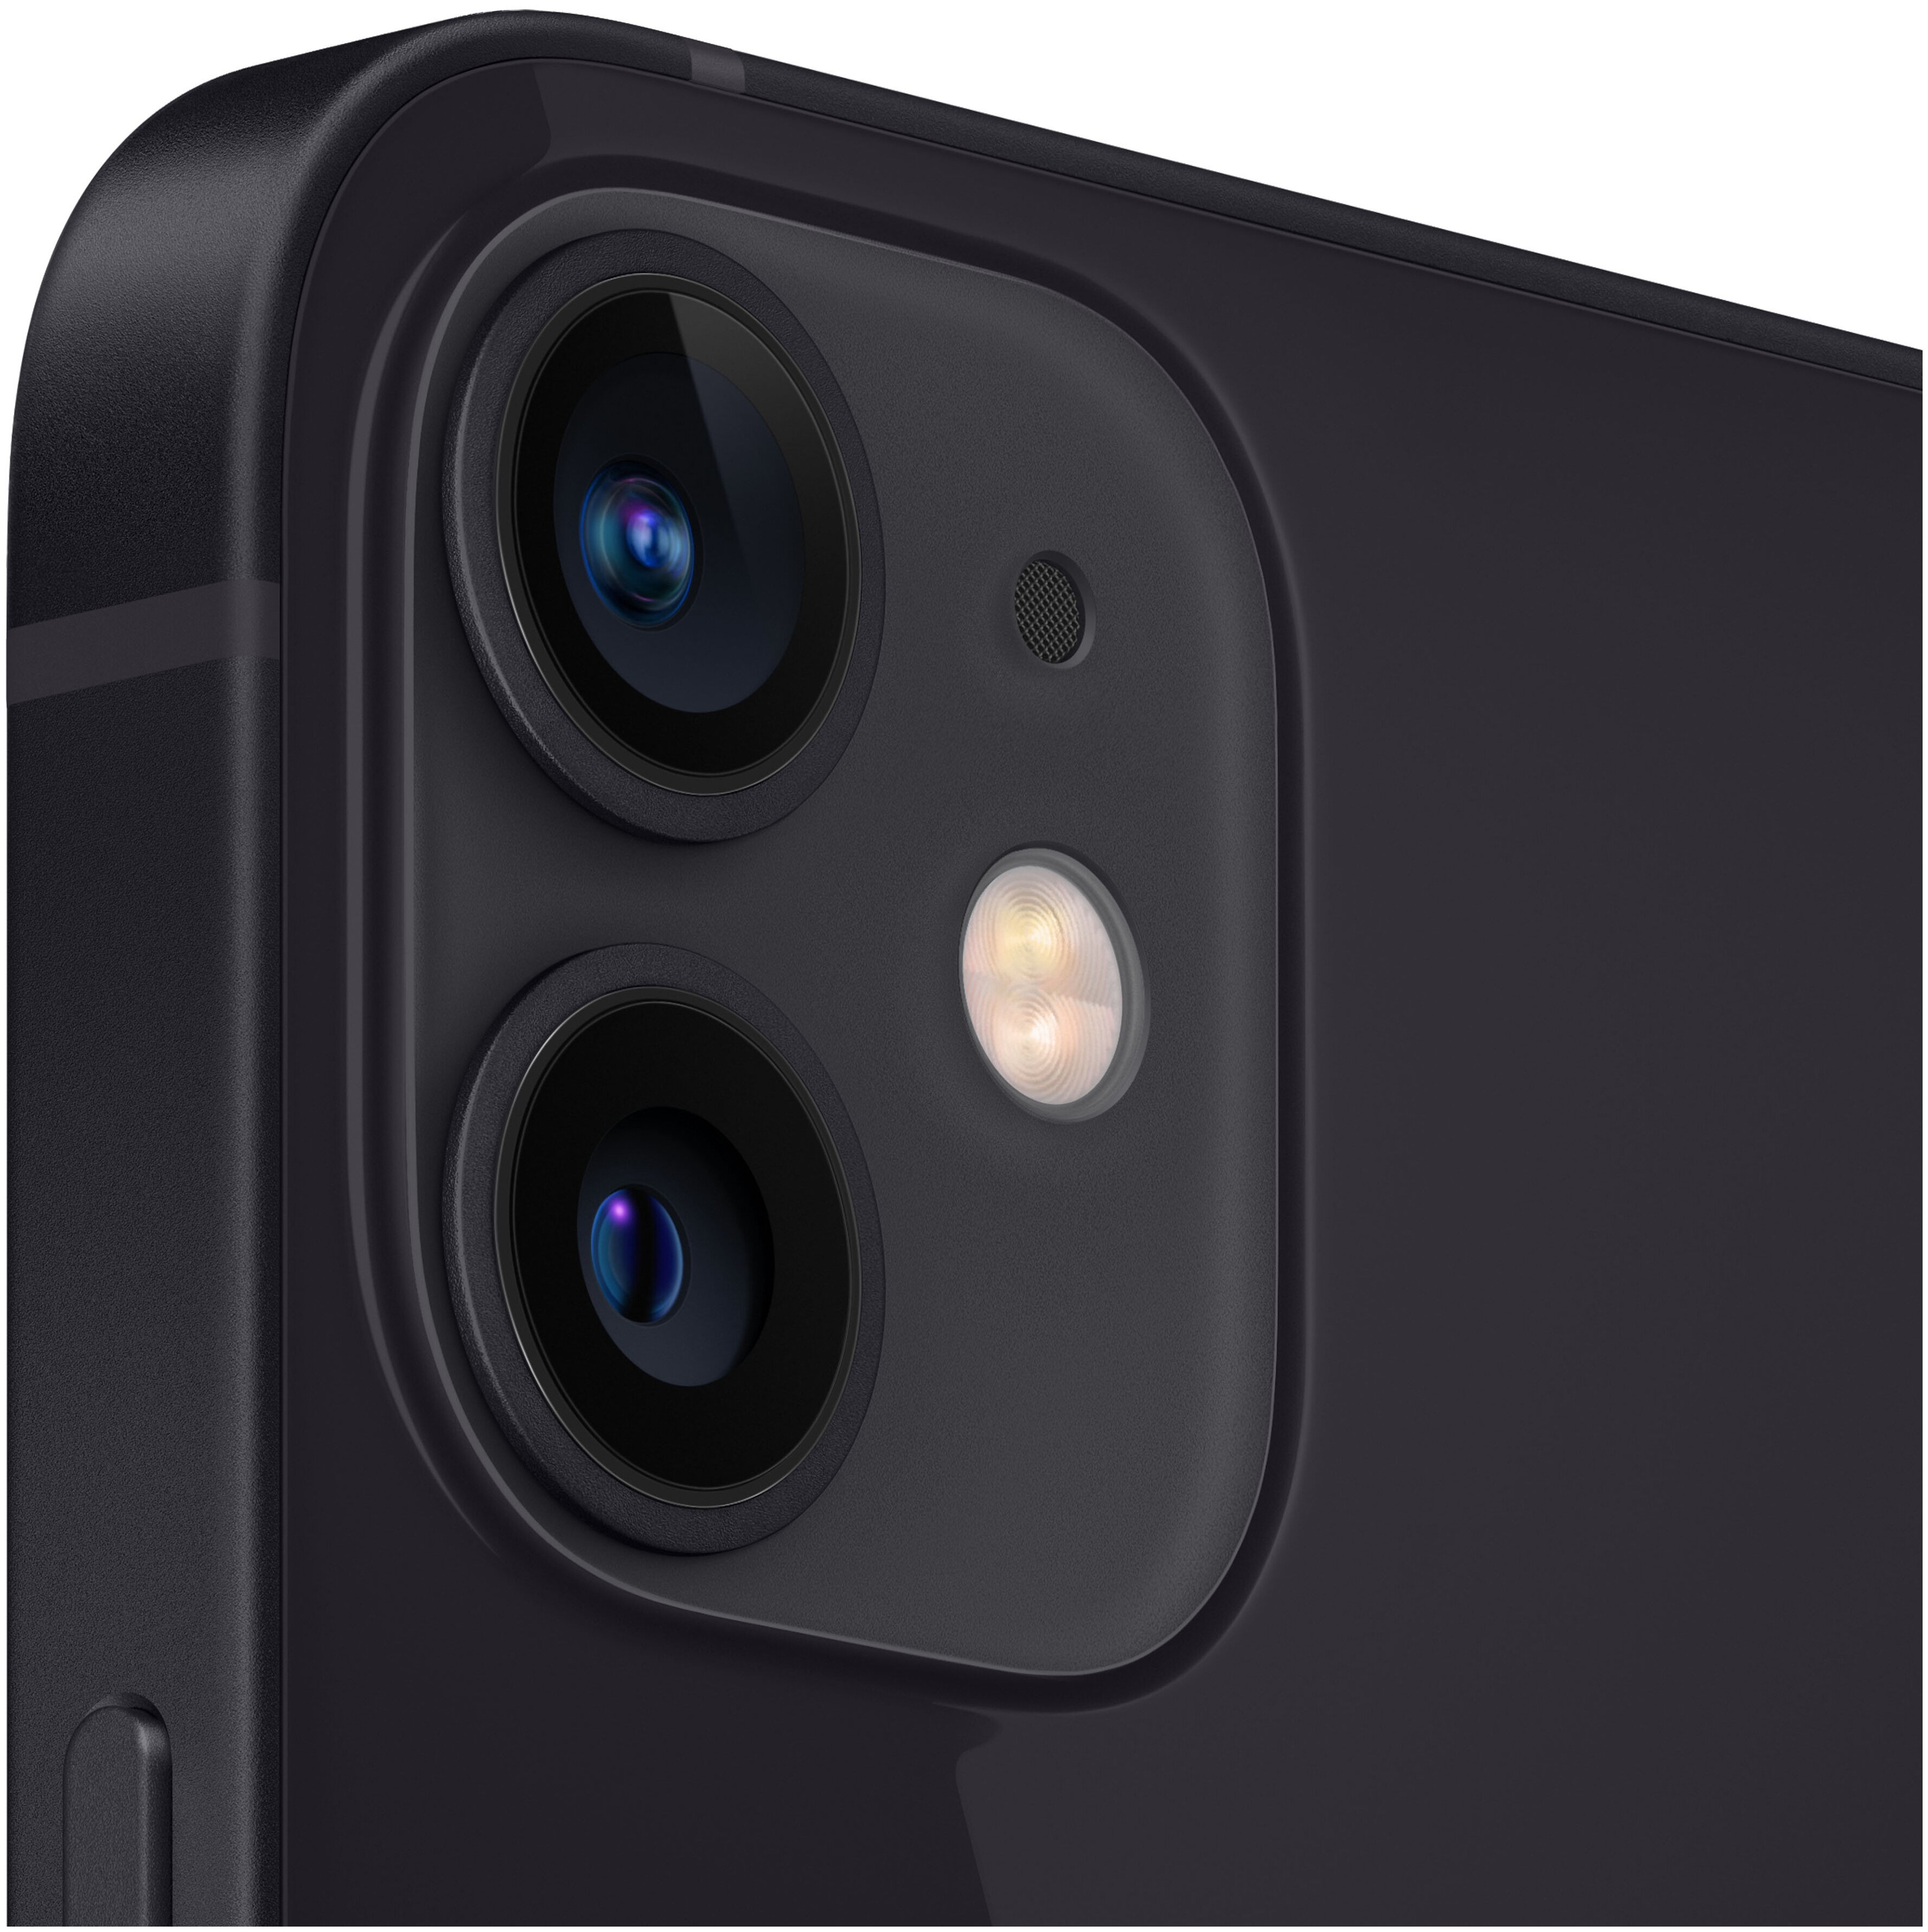 Apple iPhone 12 mini 64GB - вес: 135г